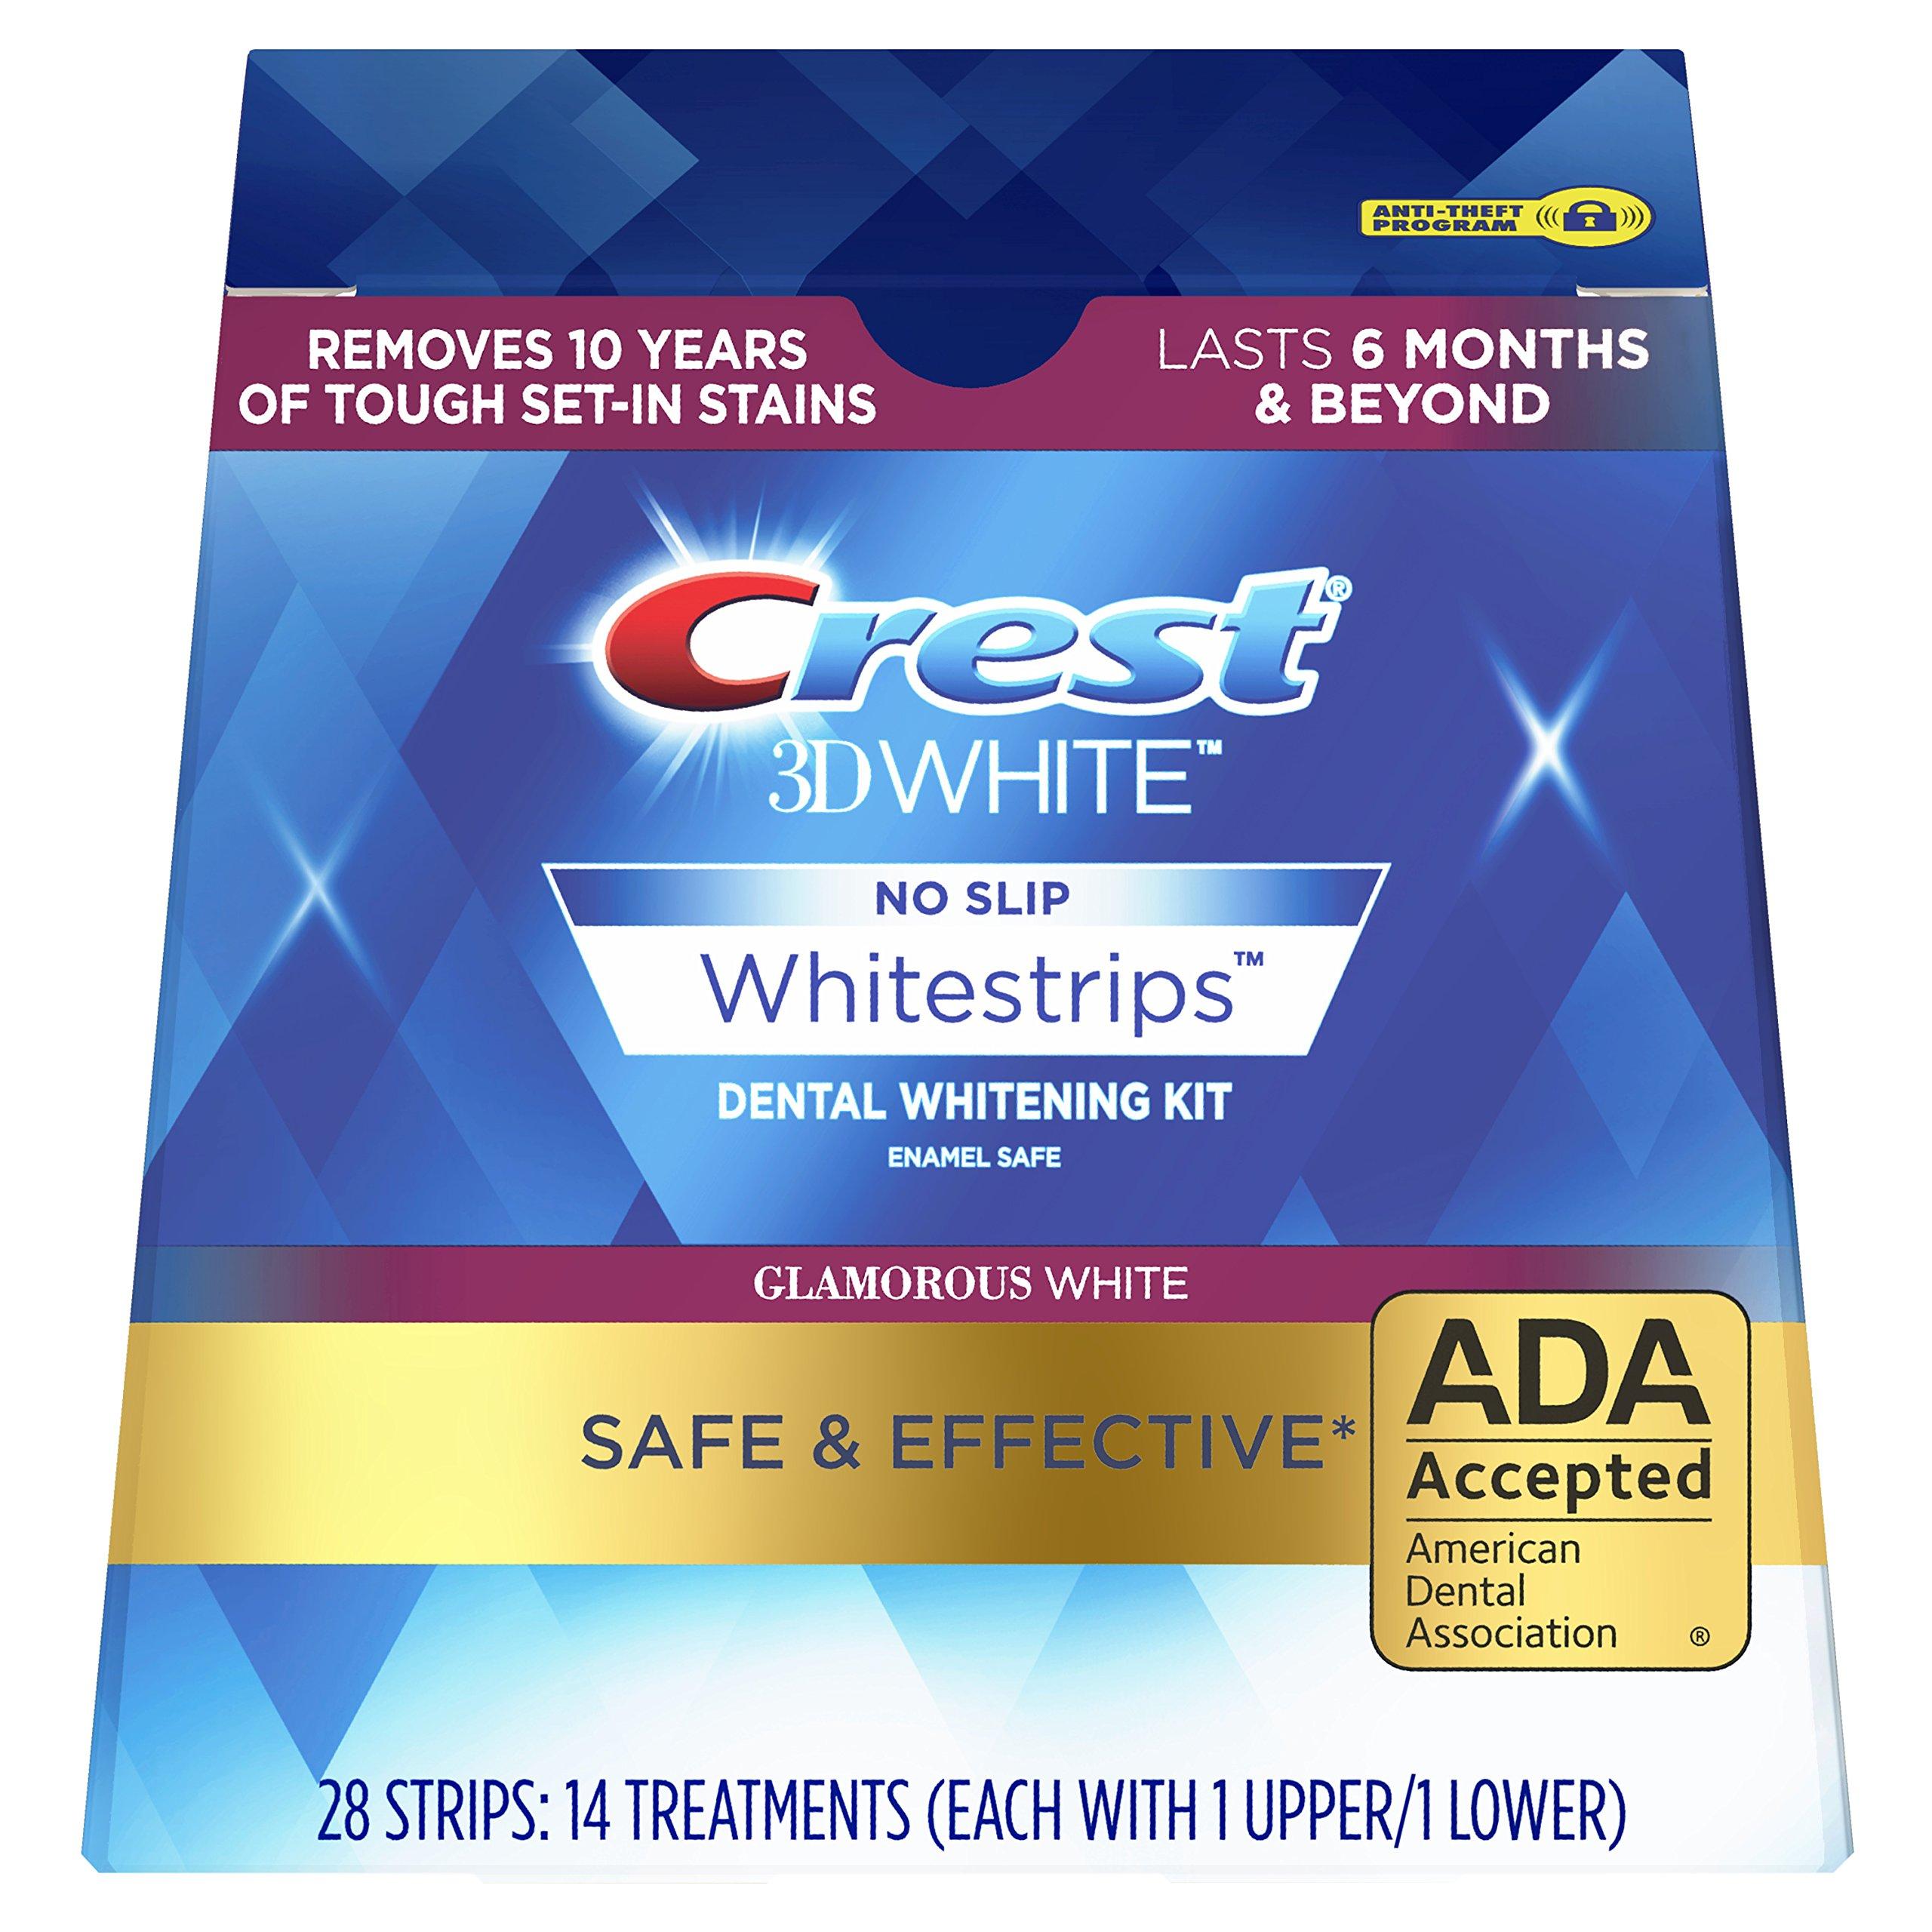 Crest Whitestrip Whitening Glamorous Treatments